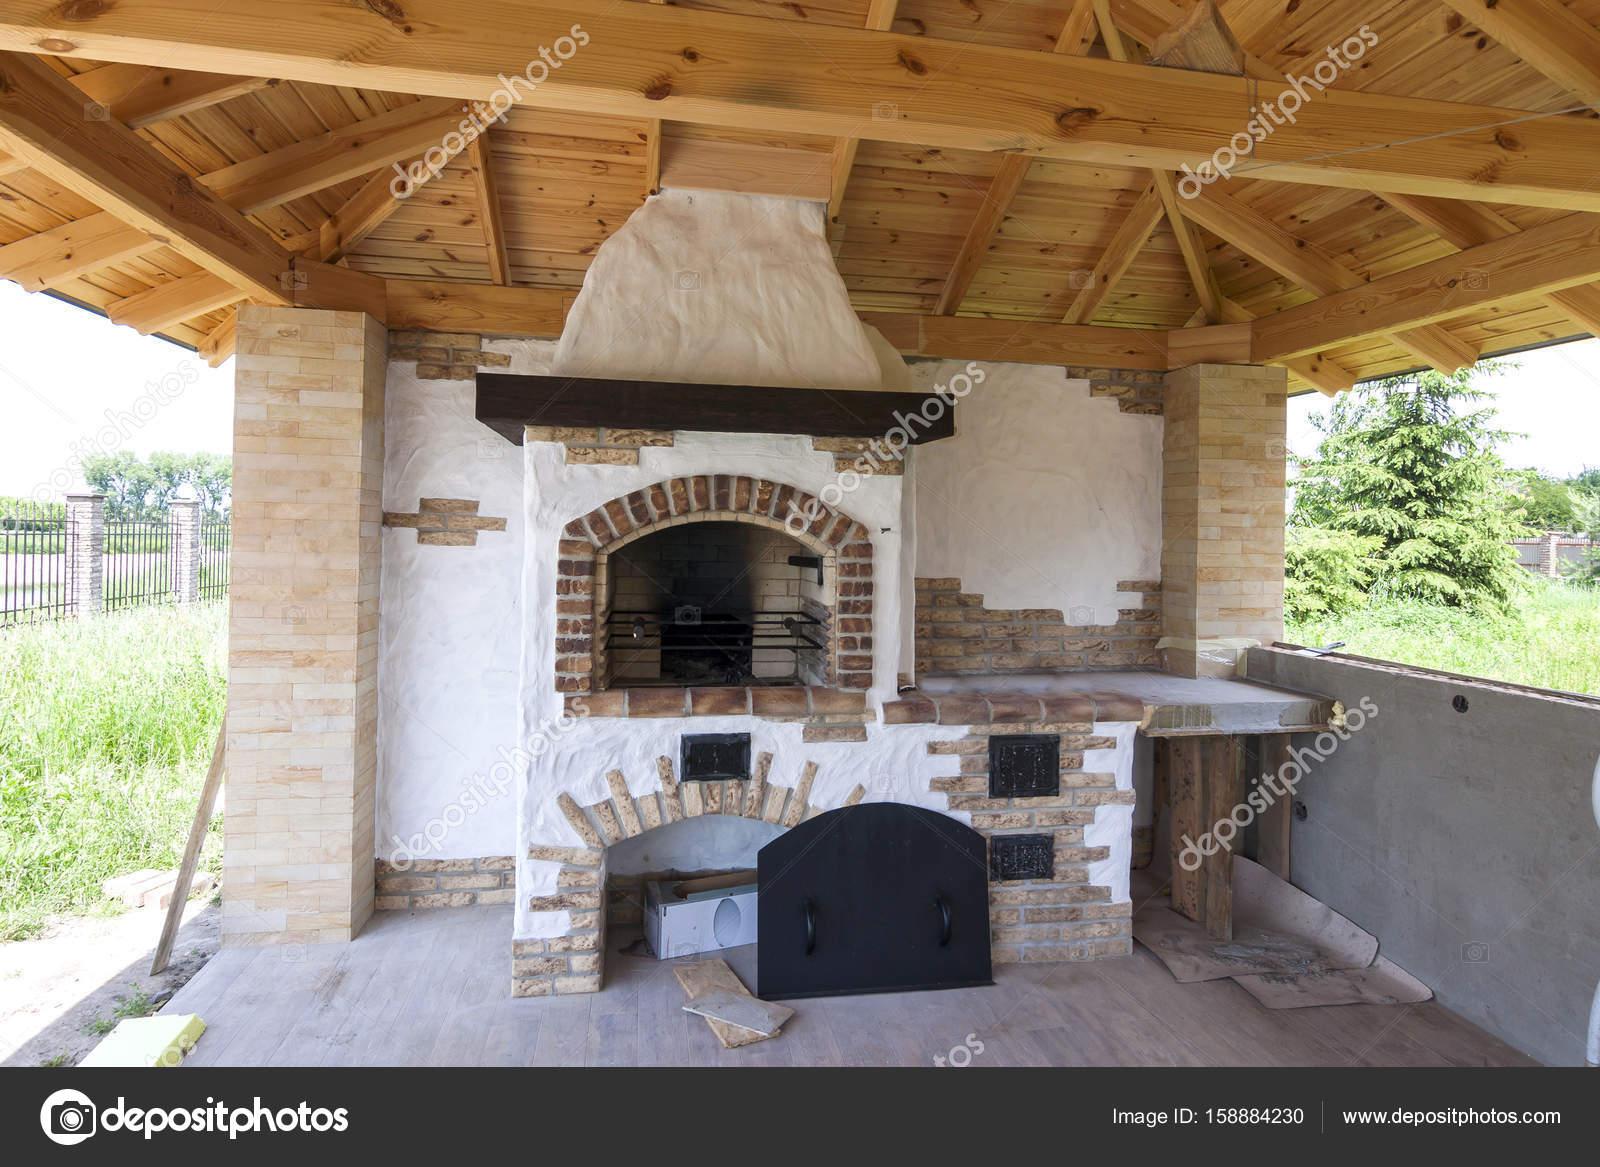 architektur, alten hausstil, veranda mit grill kamin gro — stockfoto